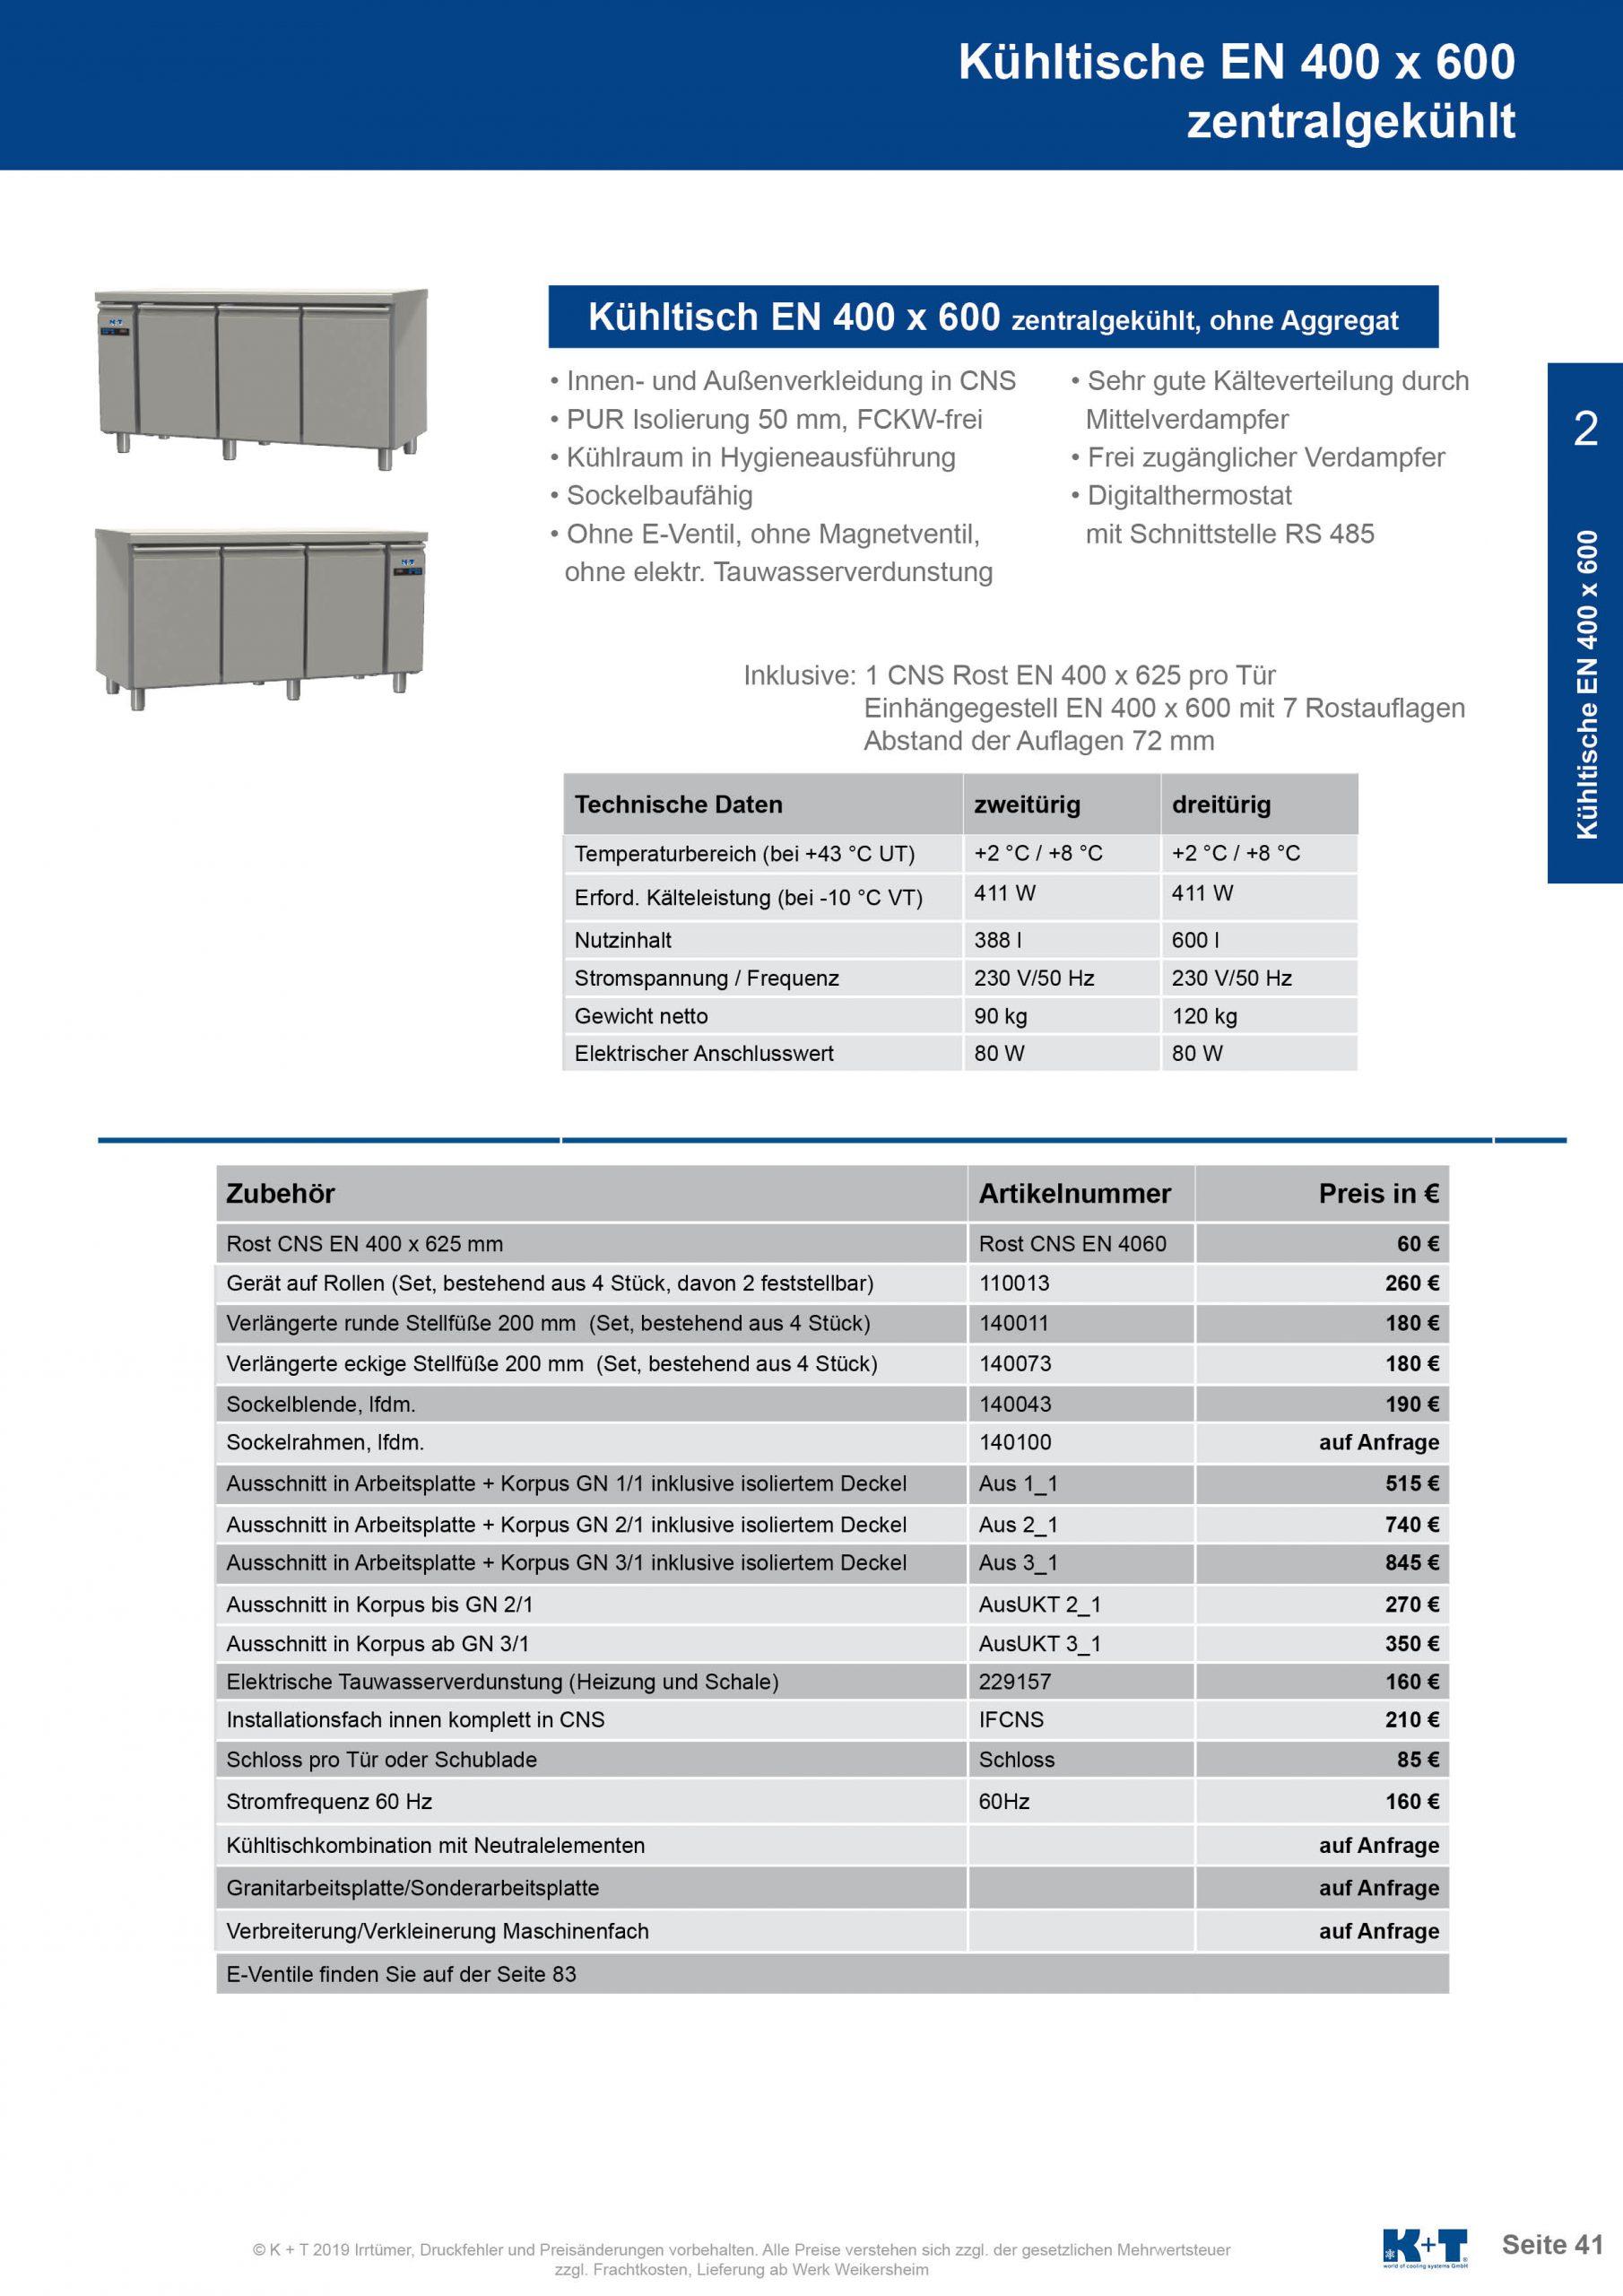 Kühltisch Euronorm 400 x 600 Korpus 700 zentralgekühlt 2